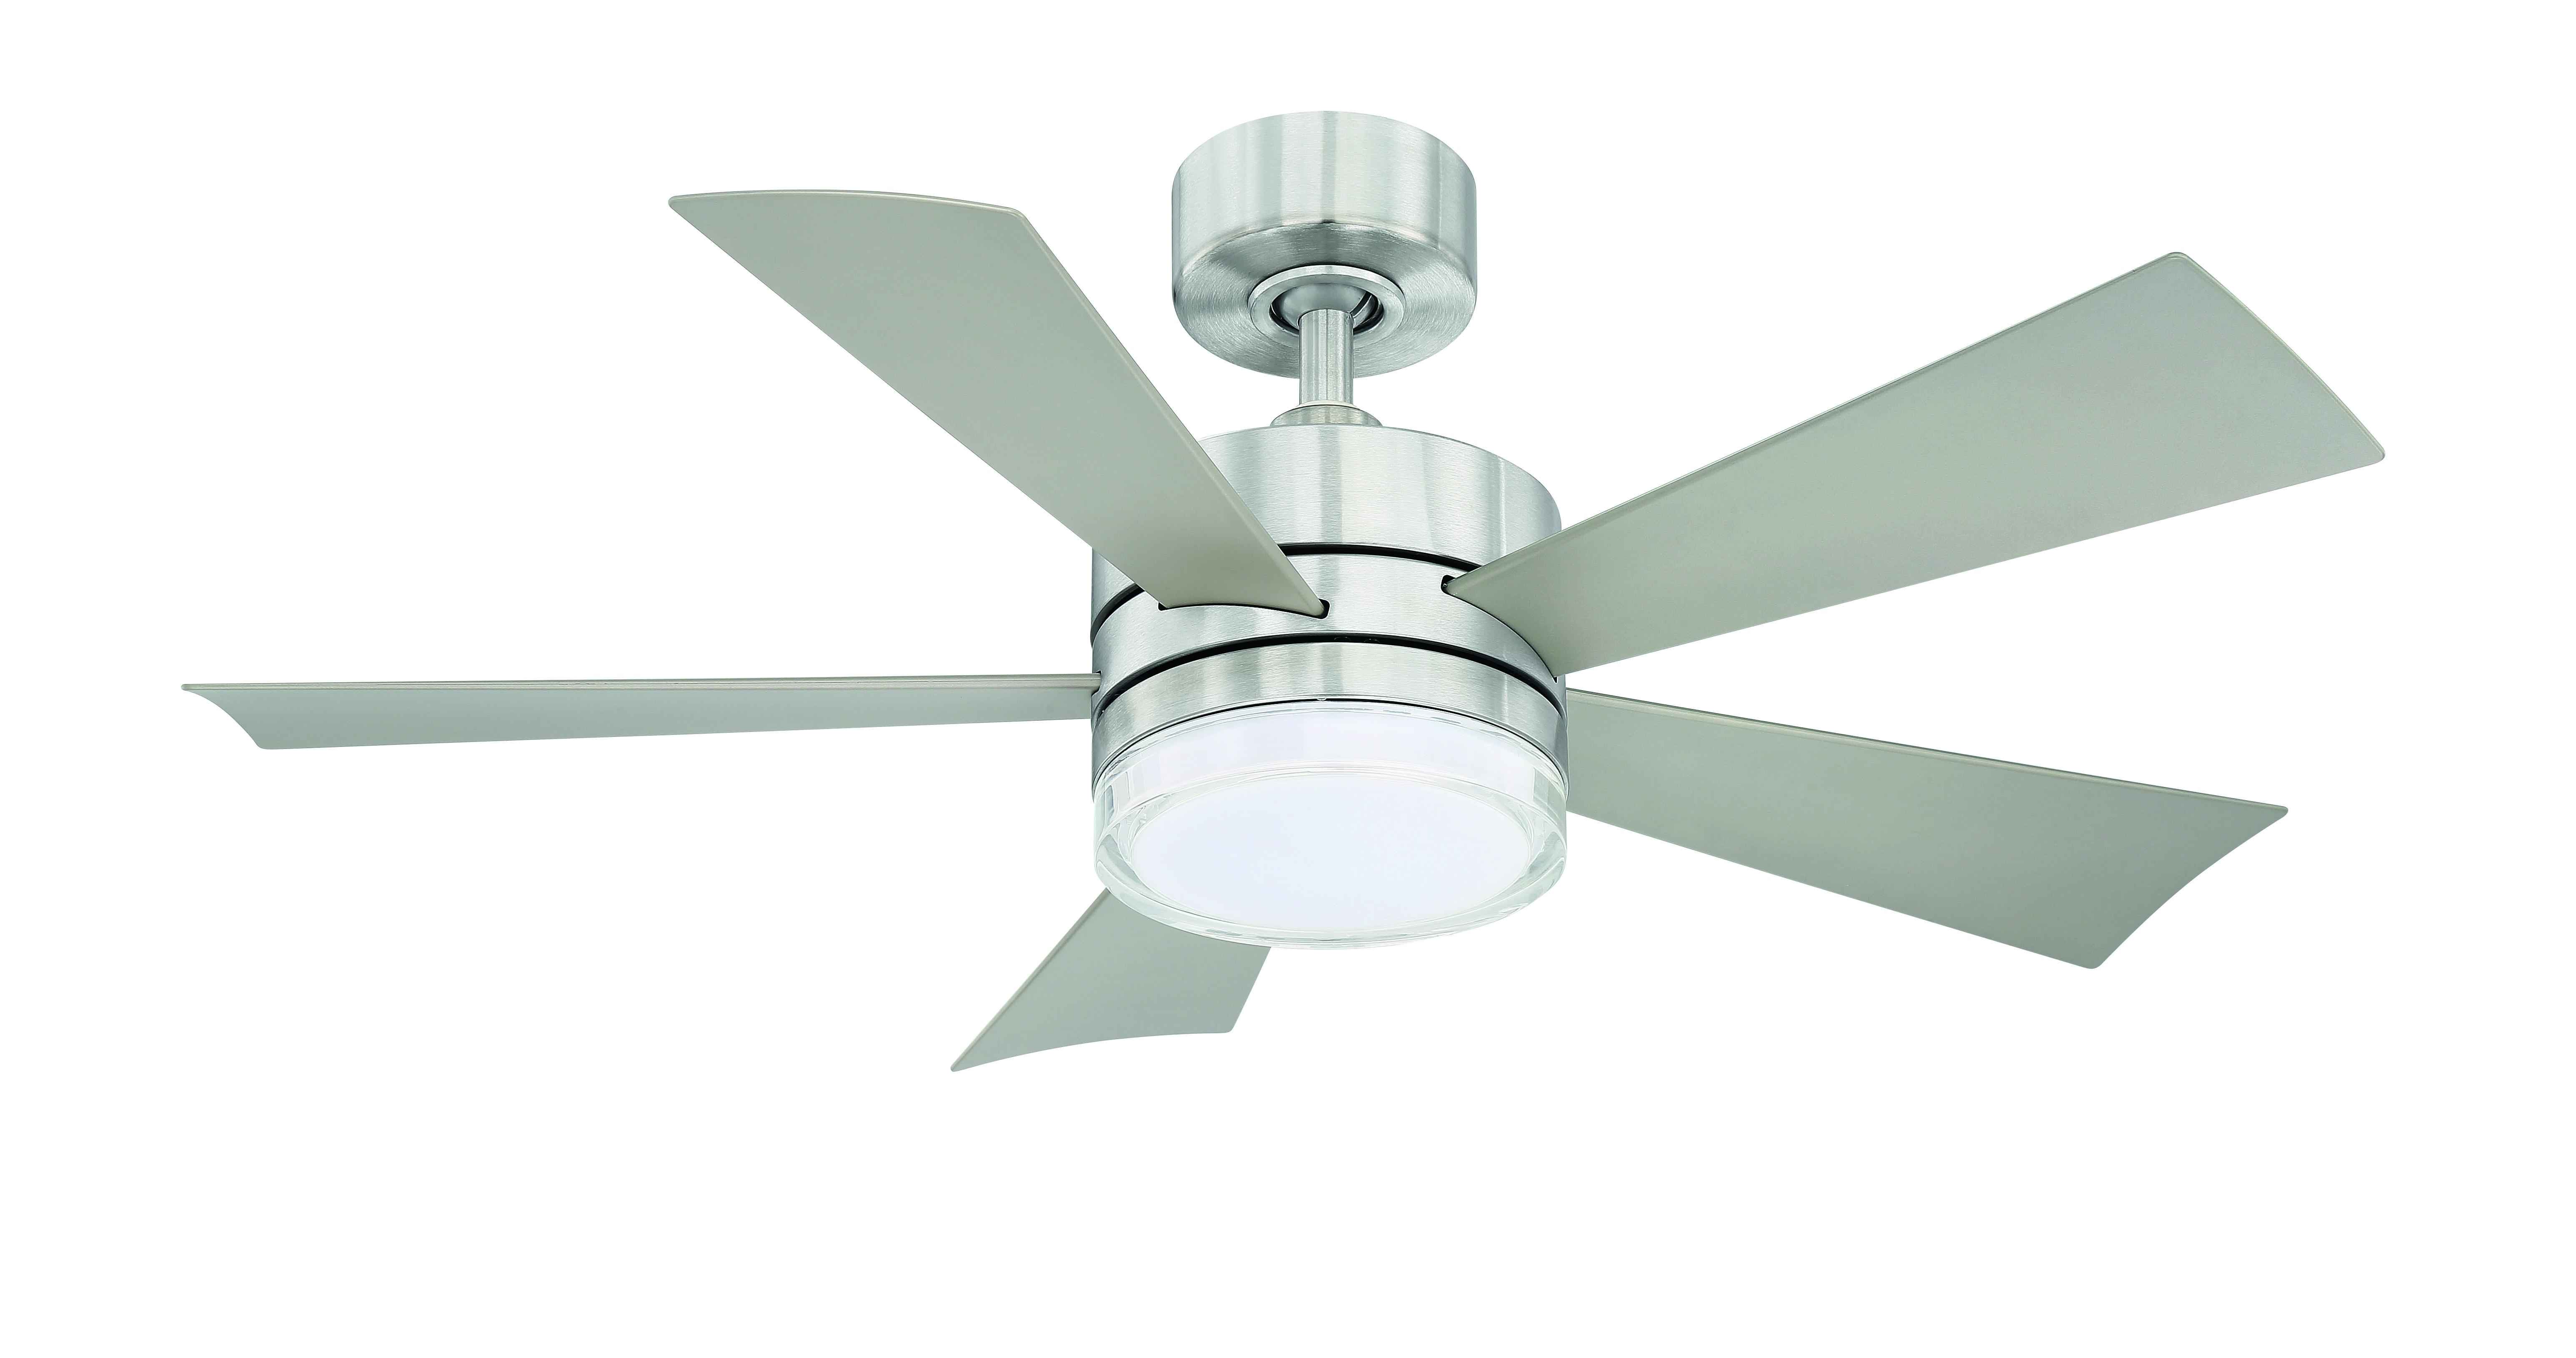 Modern Forms Wynd ceiling fan